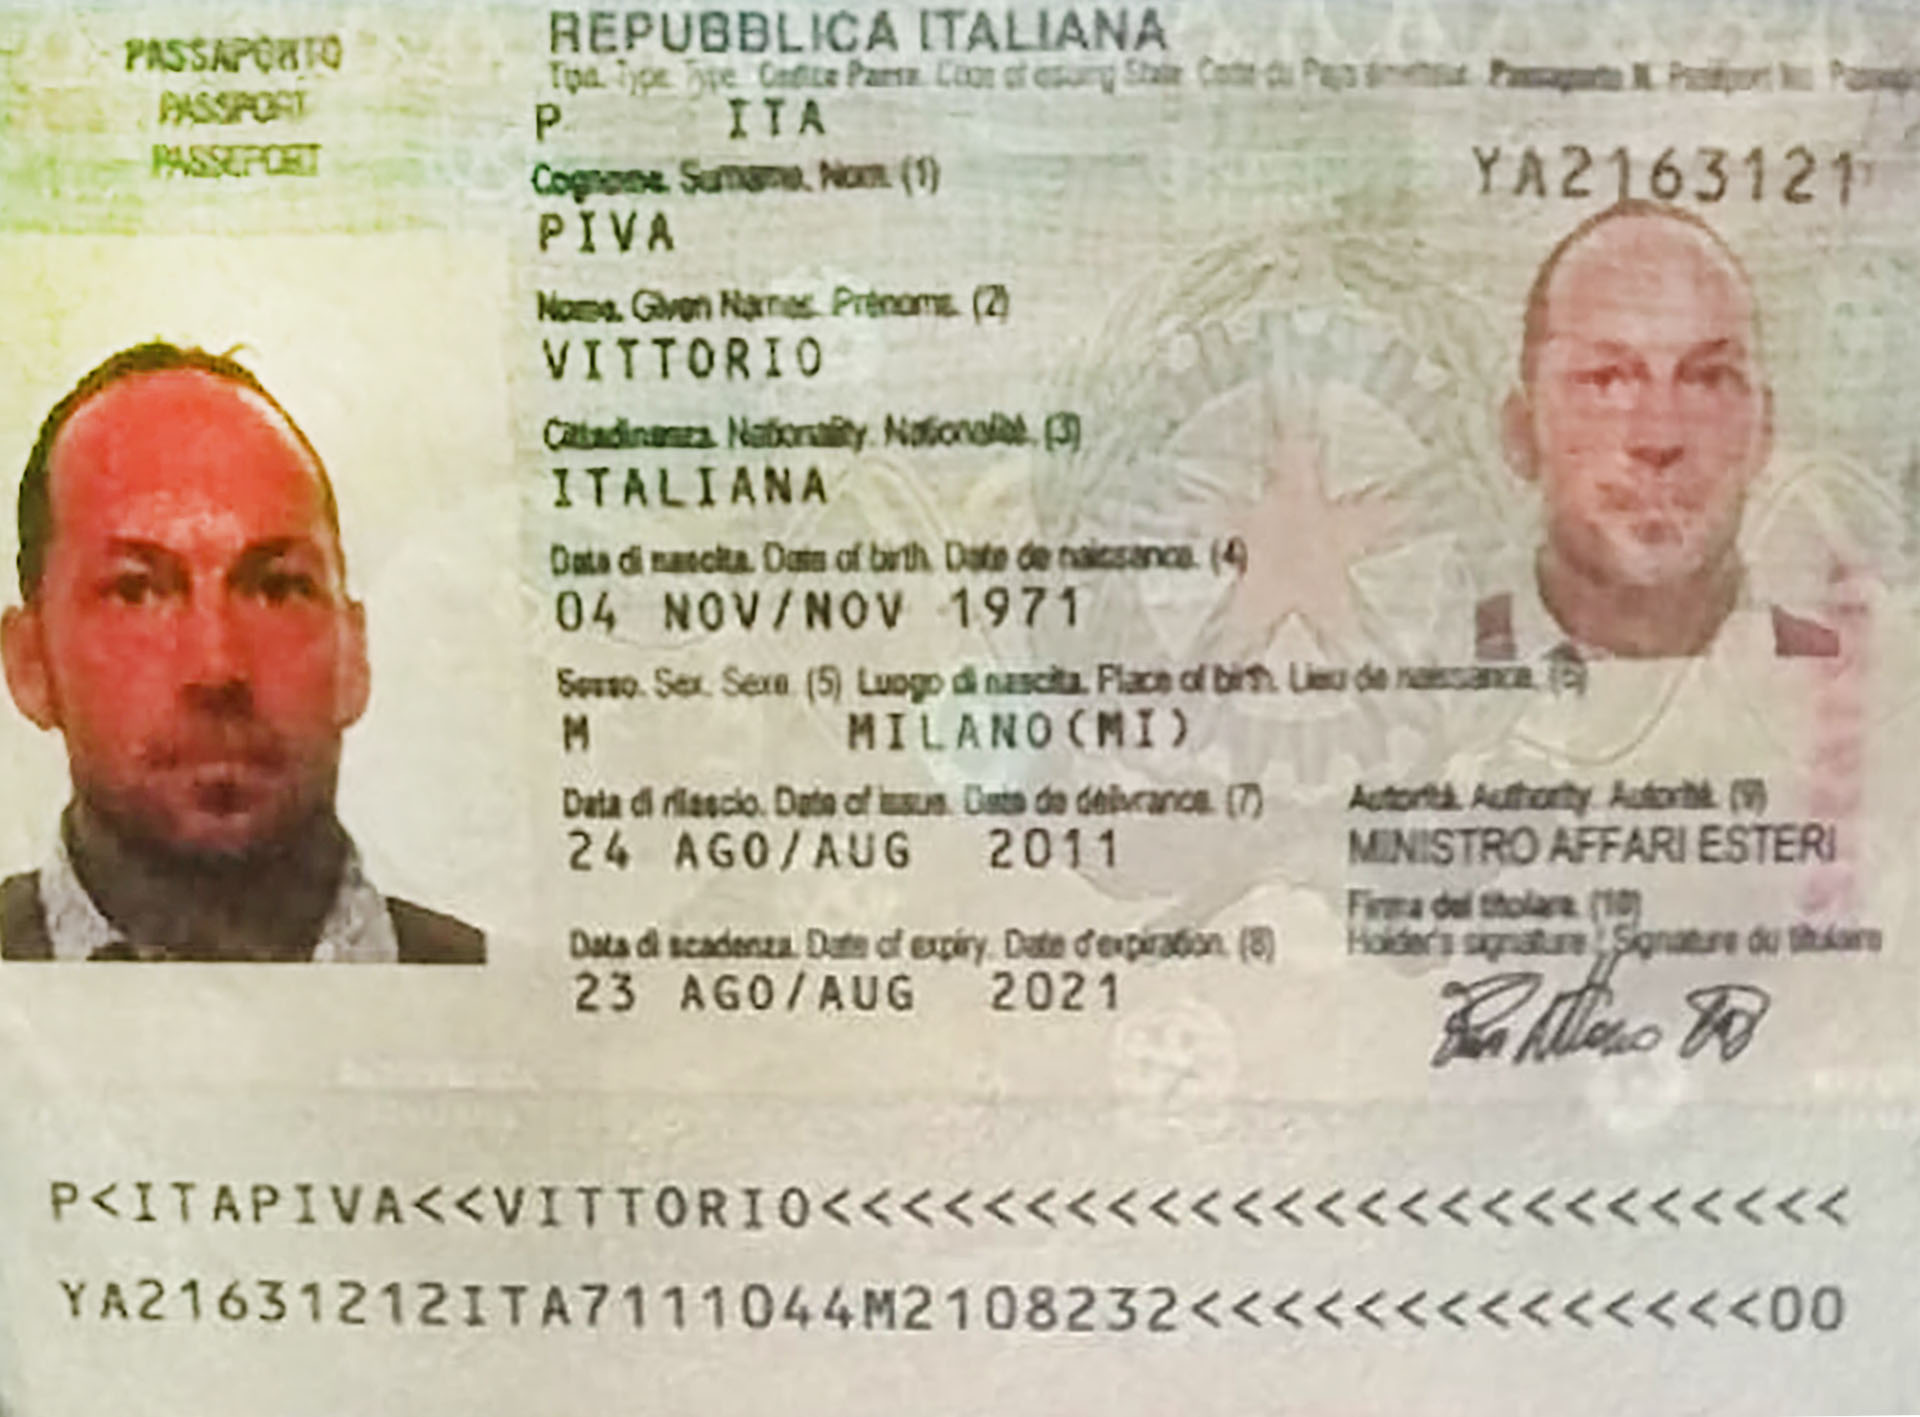 El pasaporte dePiva